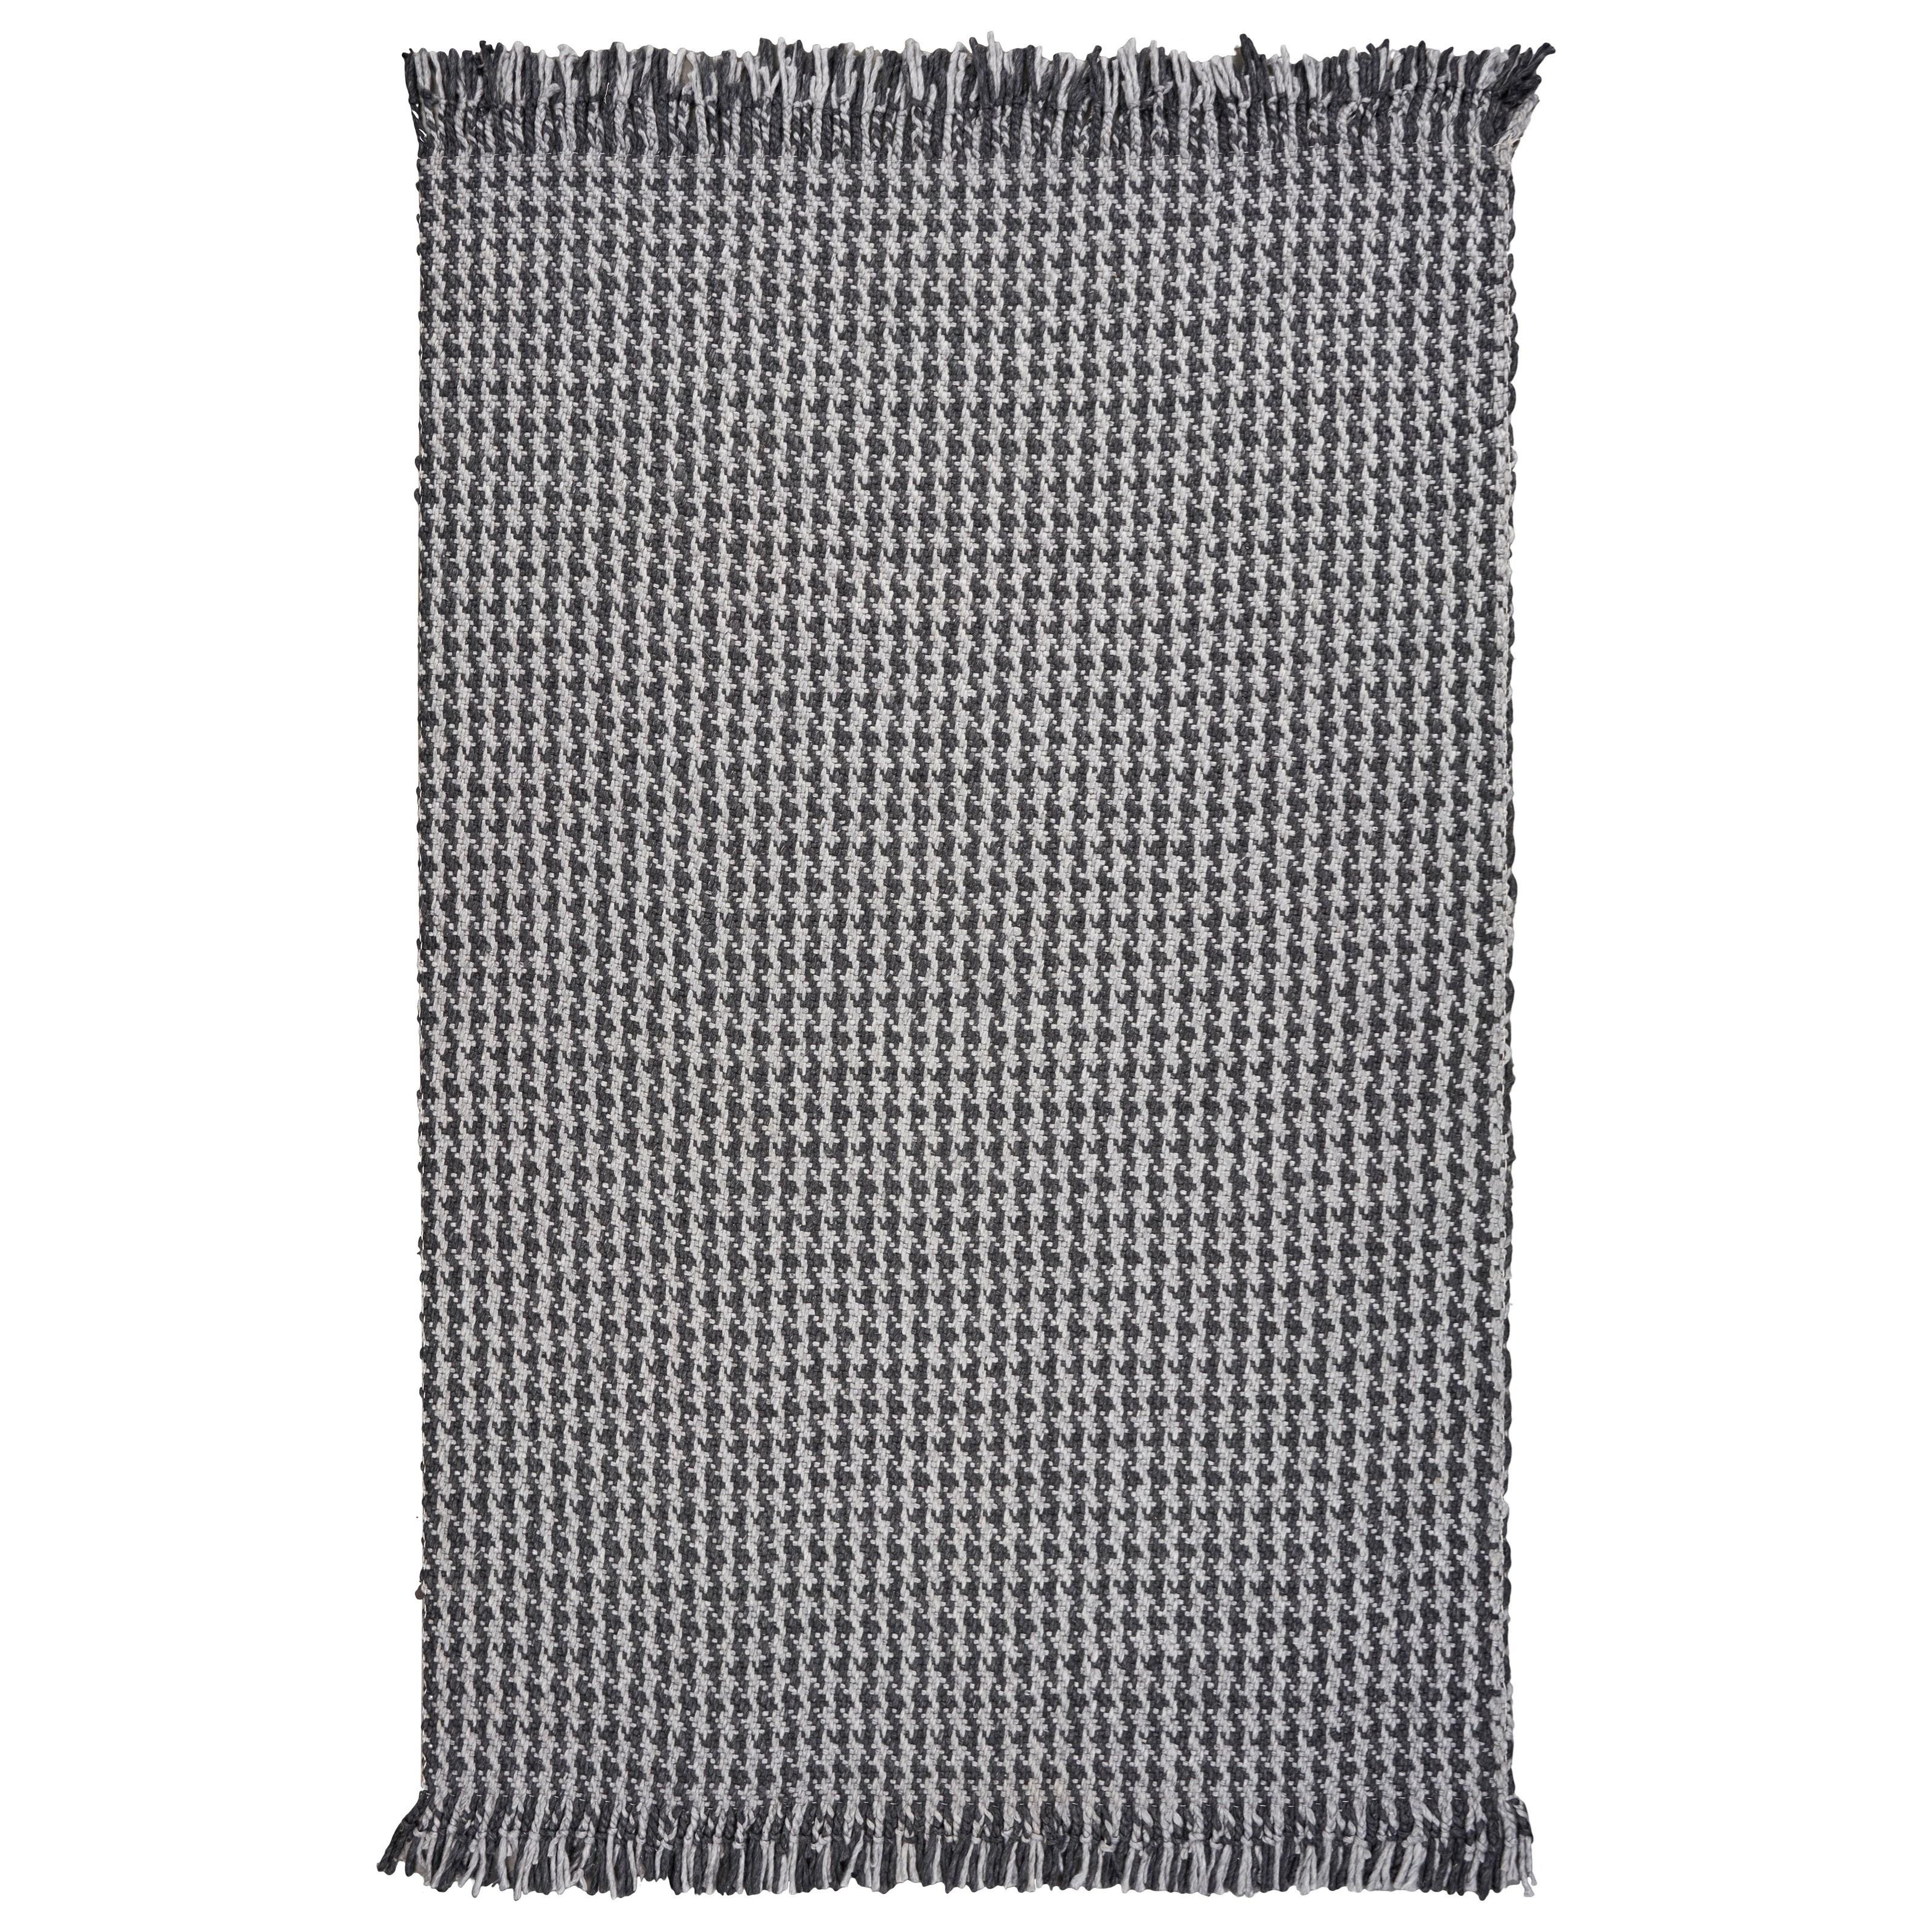 5' x 8' Grey Houndstooth Rug